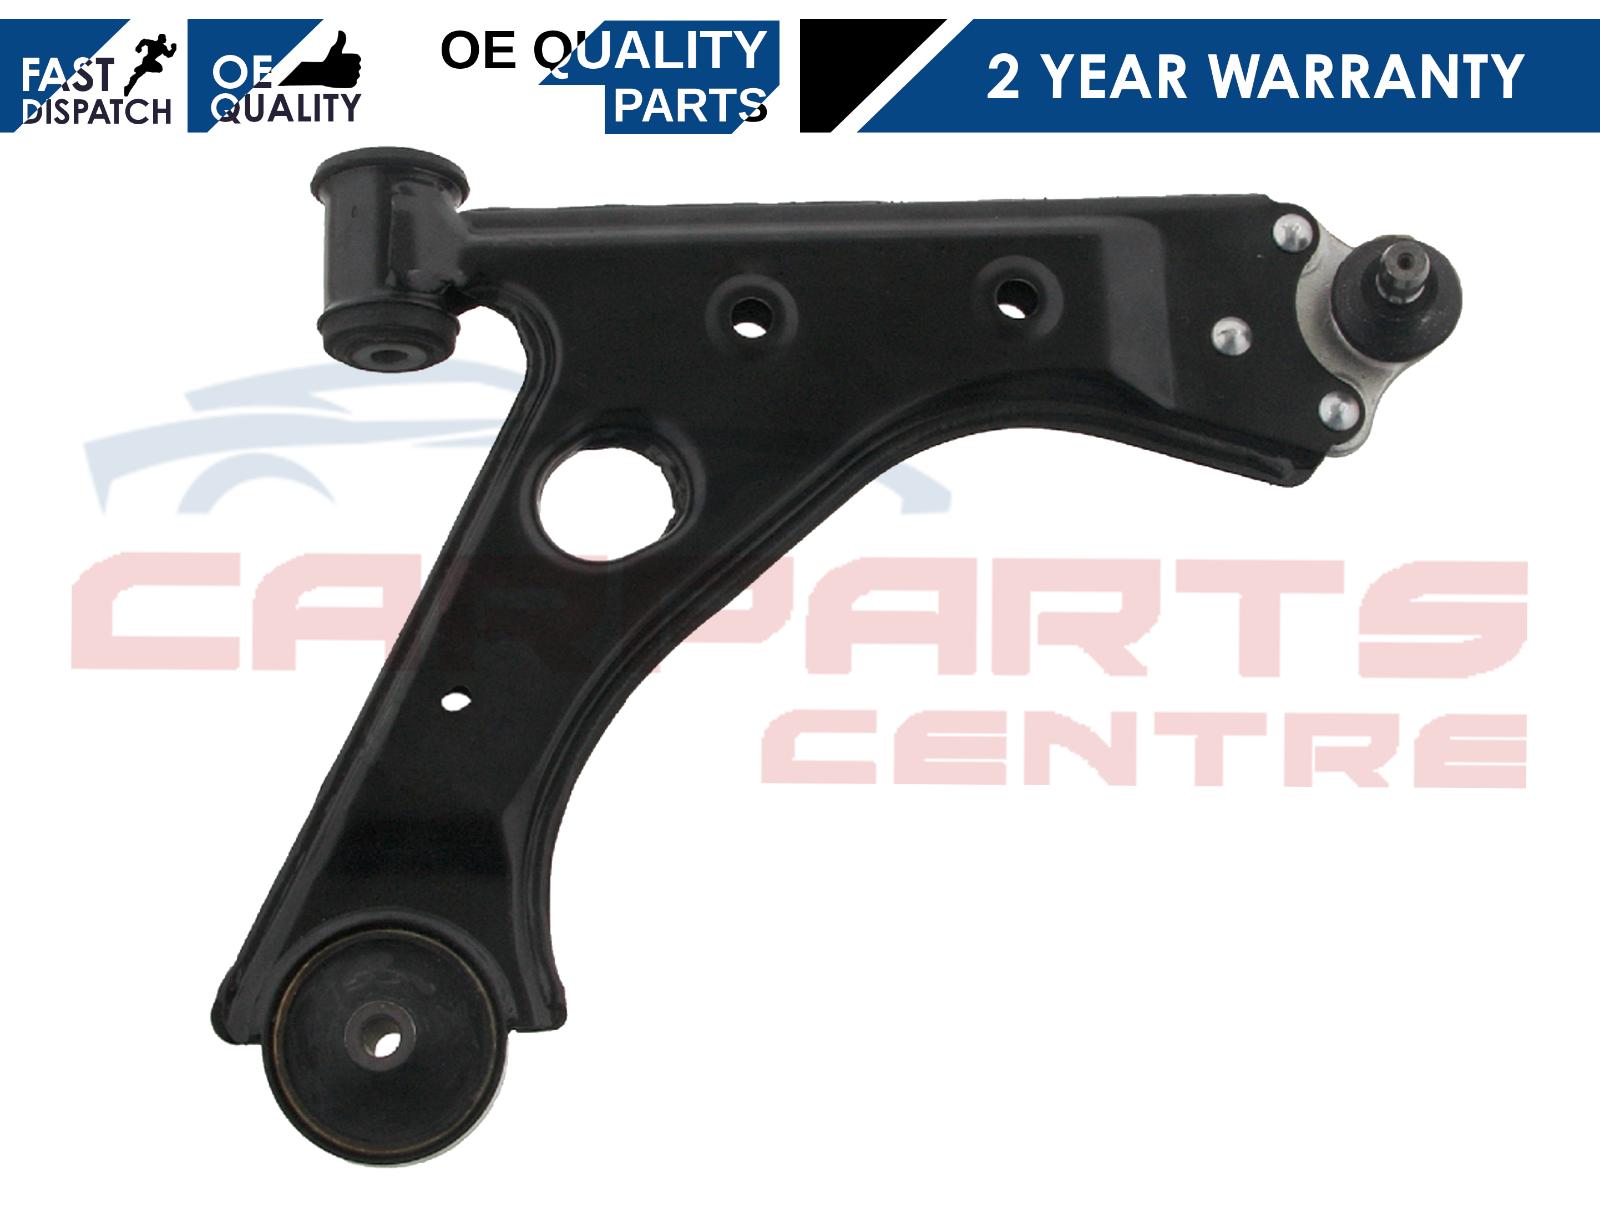 Premium Driver Side Wiper Blade Fits Vauxhall Corsa MK II Hatch 1.3 CDTI 16V